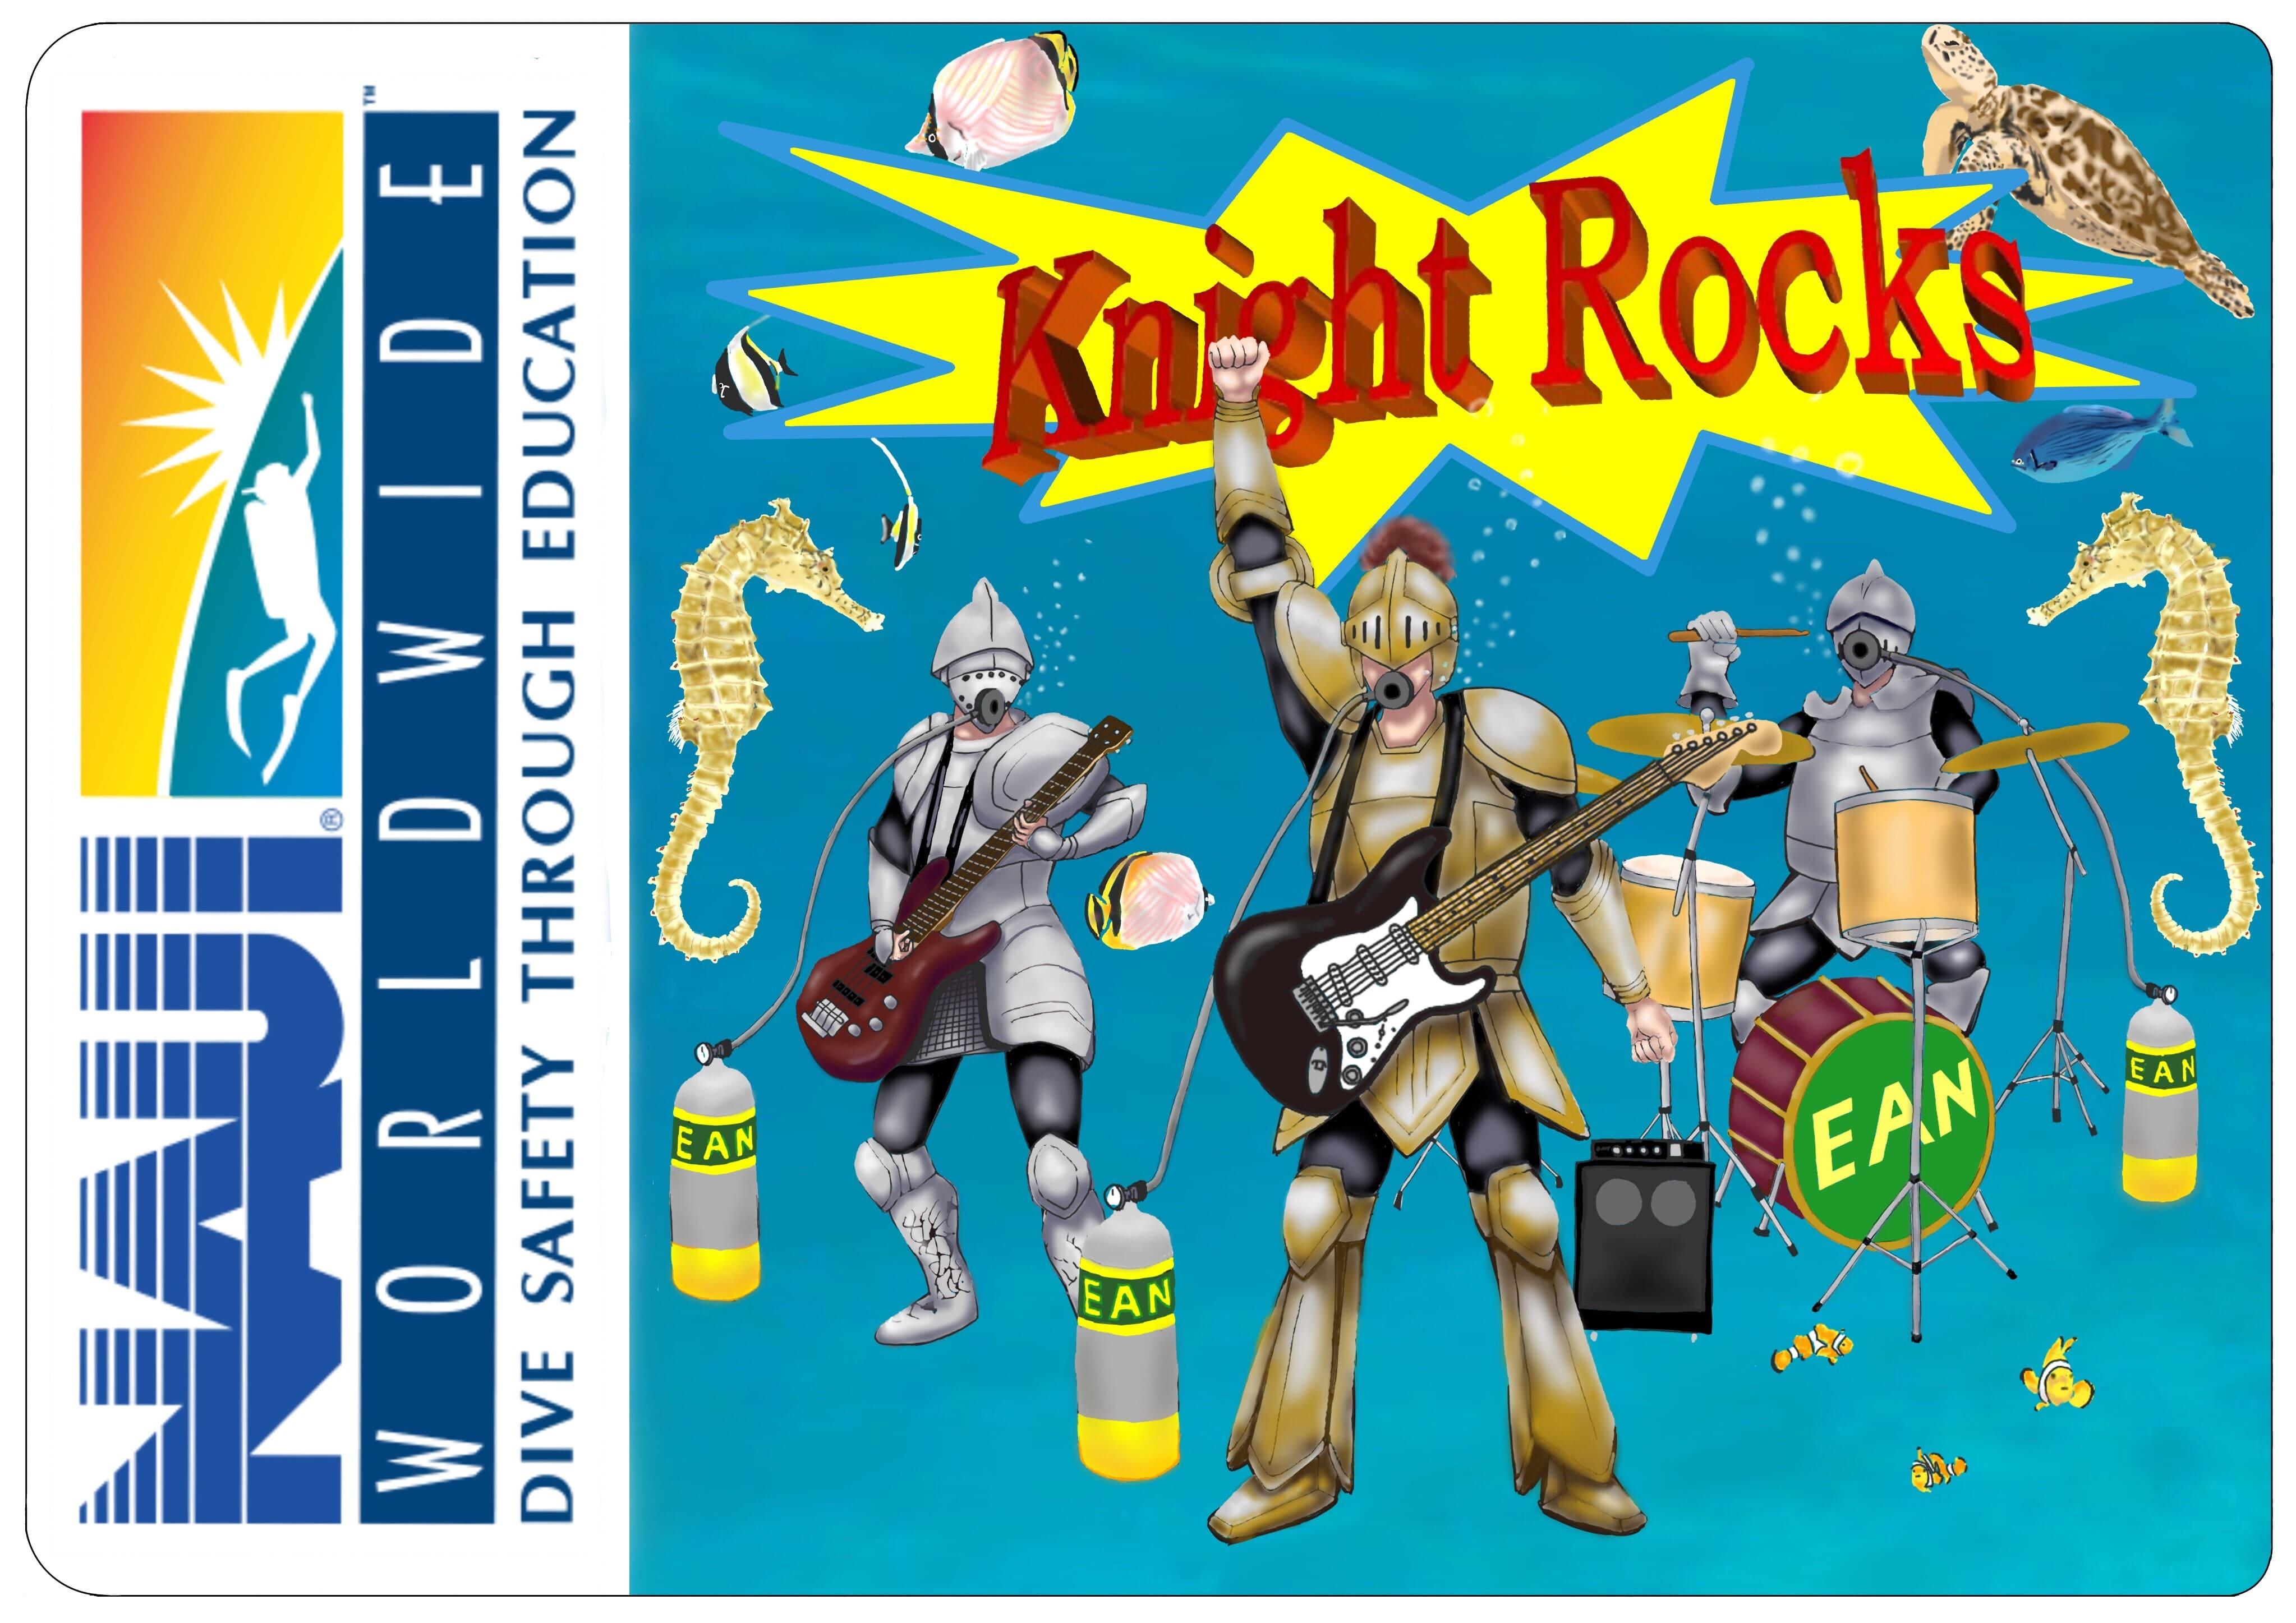 Knight Rocksバンド結成!一夜限りのライブ開催!!